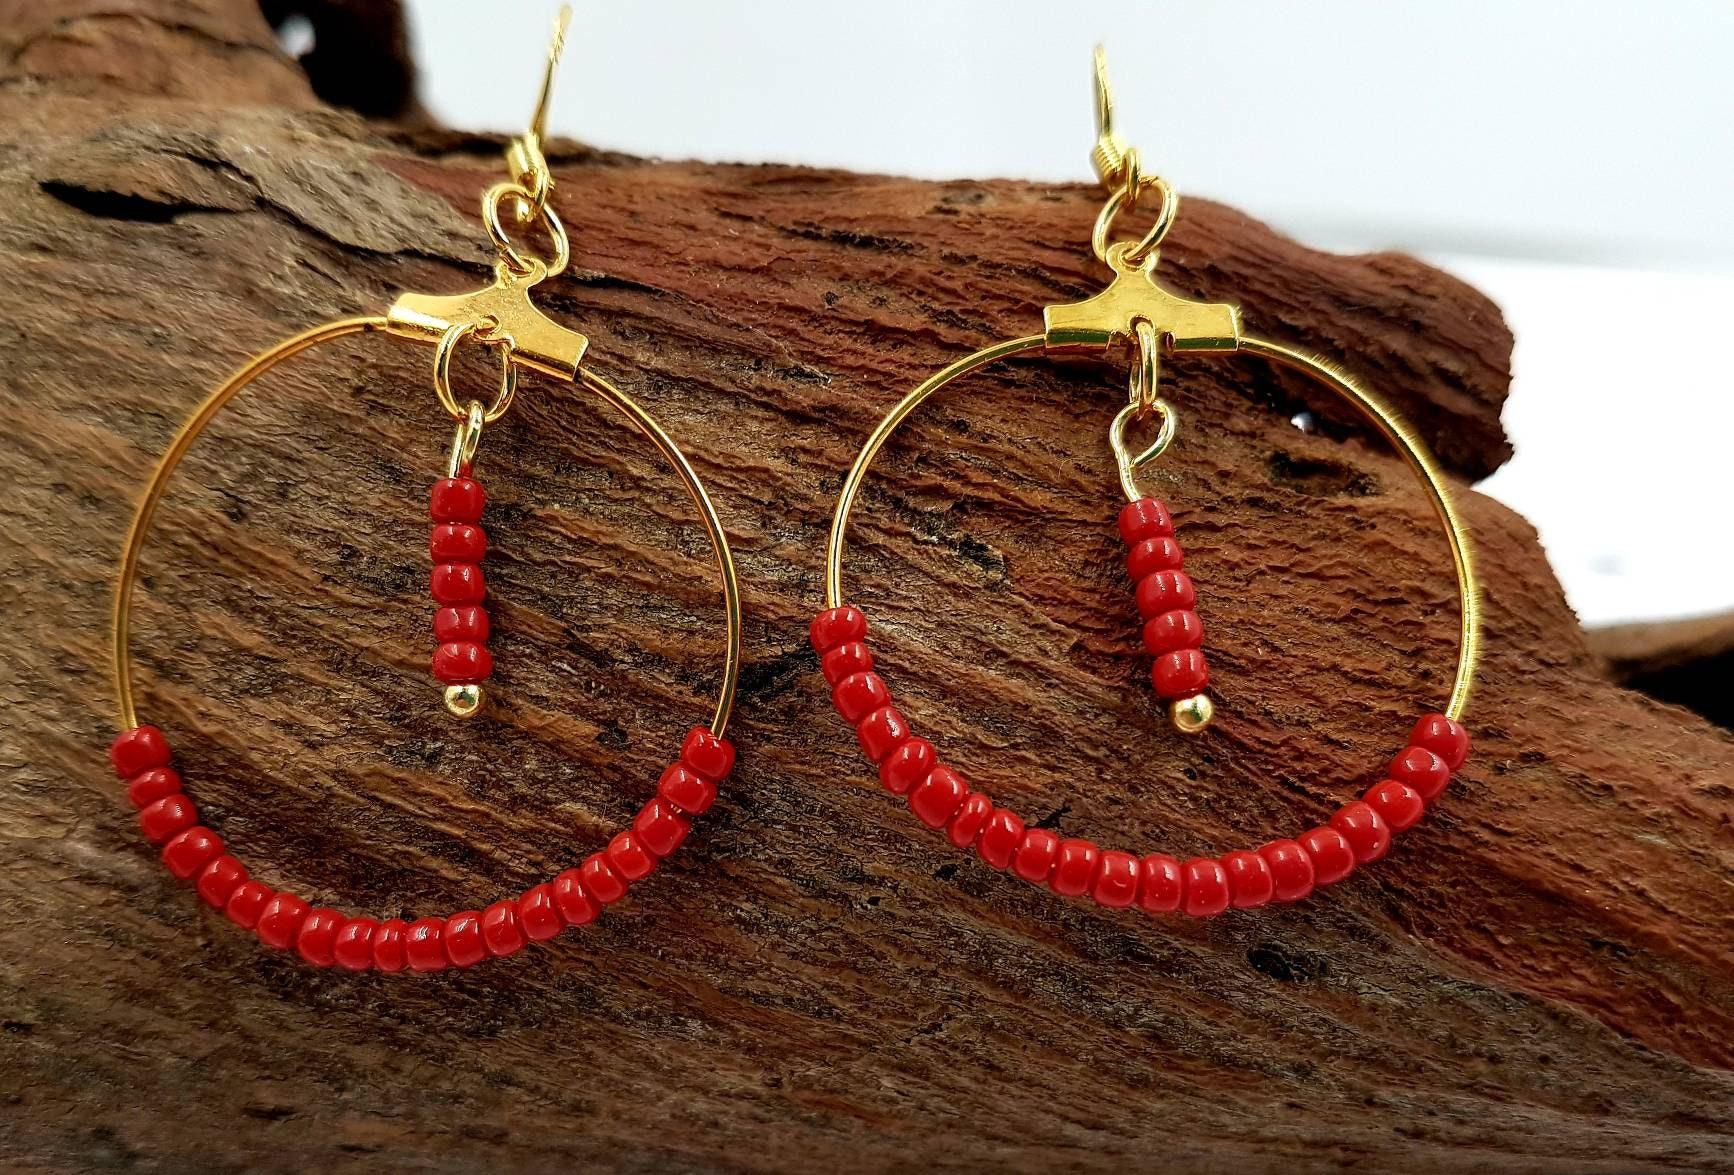 Red Coral Earrings Dangle Statement Bridesmaid Jewelry Gift Beachy Earrings Dainty Long Bar Earrings Summer Threaders